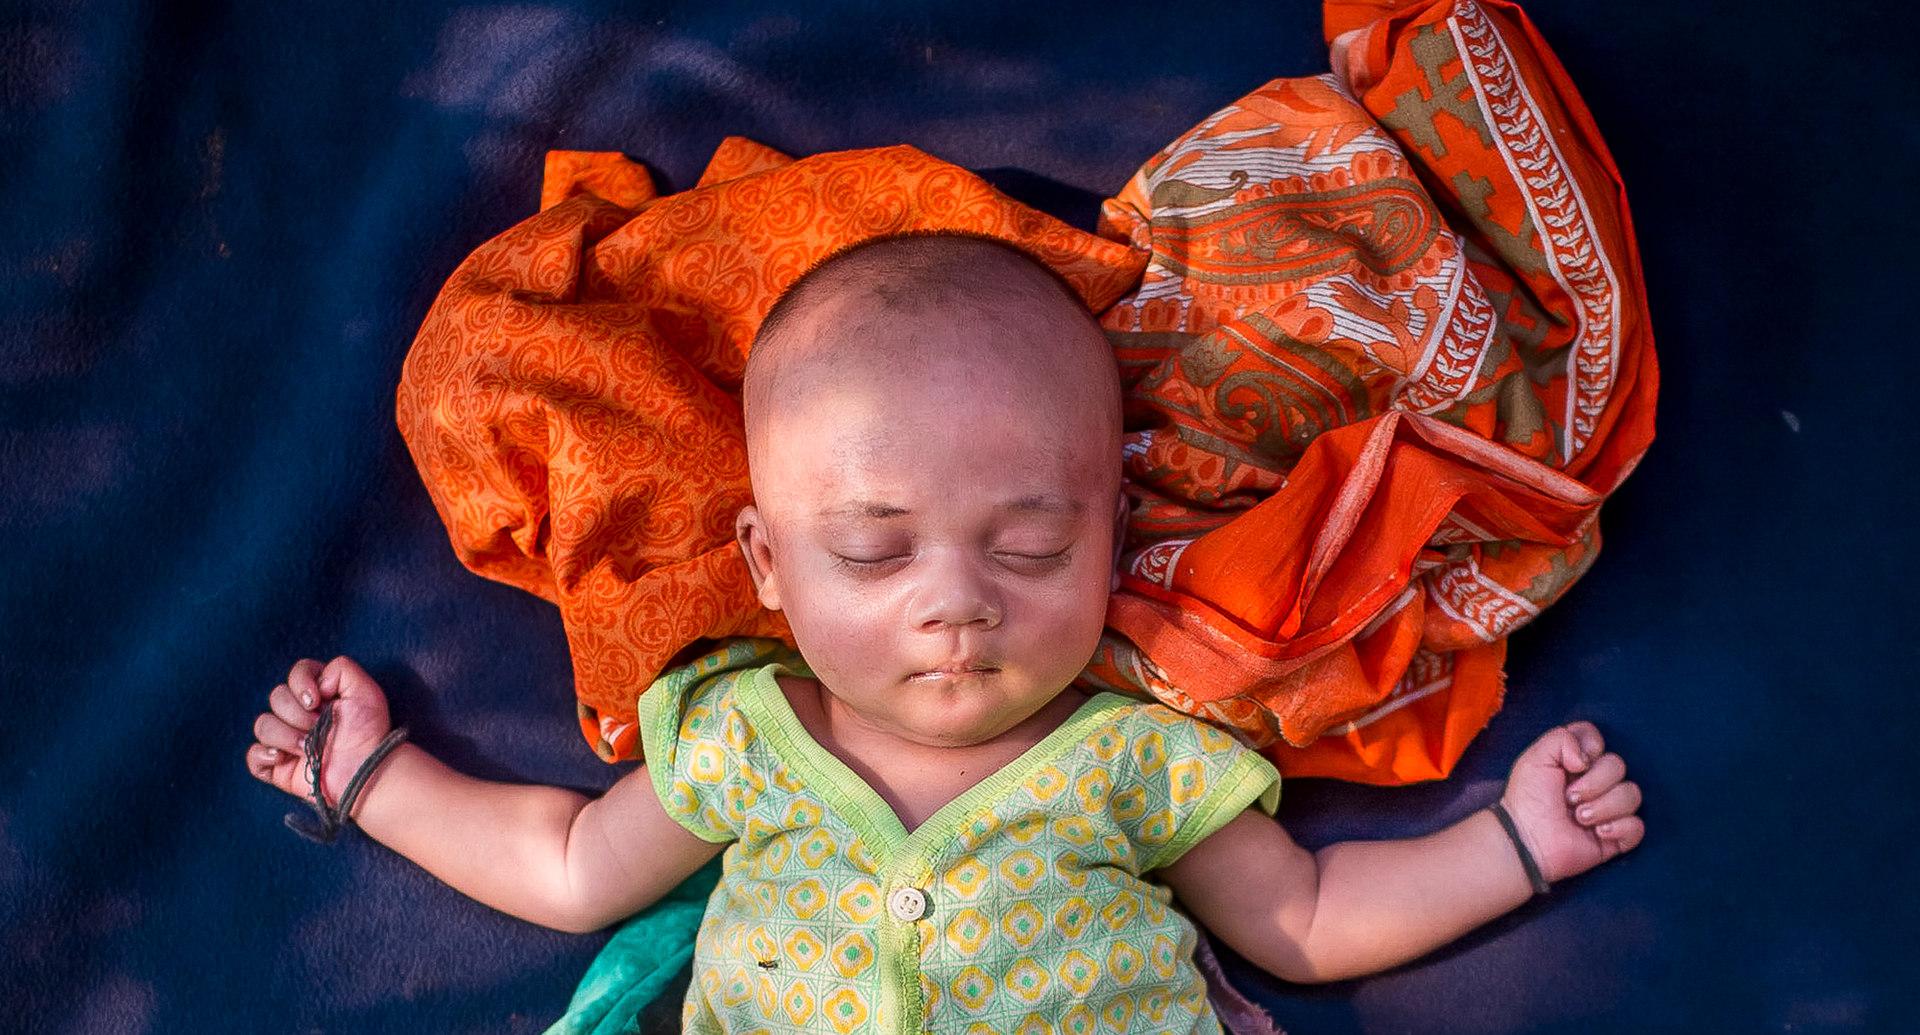 Born Refugee: Unnamed, 18 day old, born in Balukhali Rohingya refugee camp, Cox's Bazar, Bangladesh, 2017